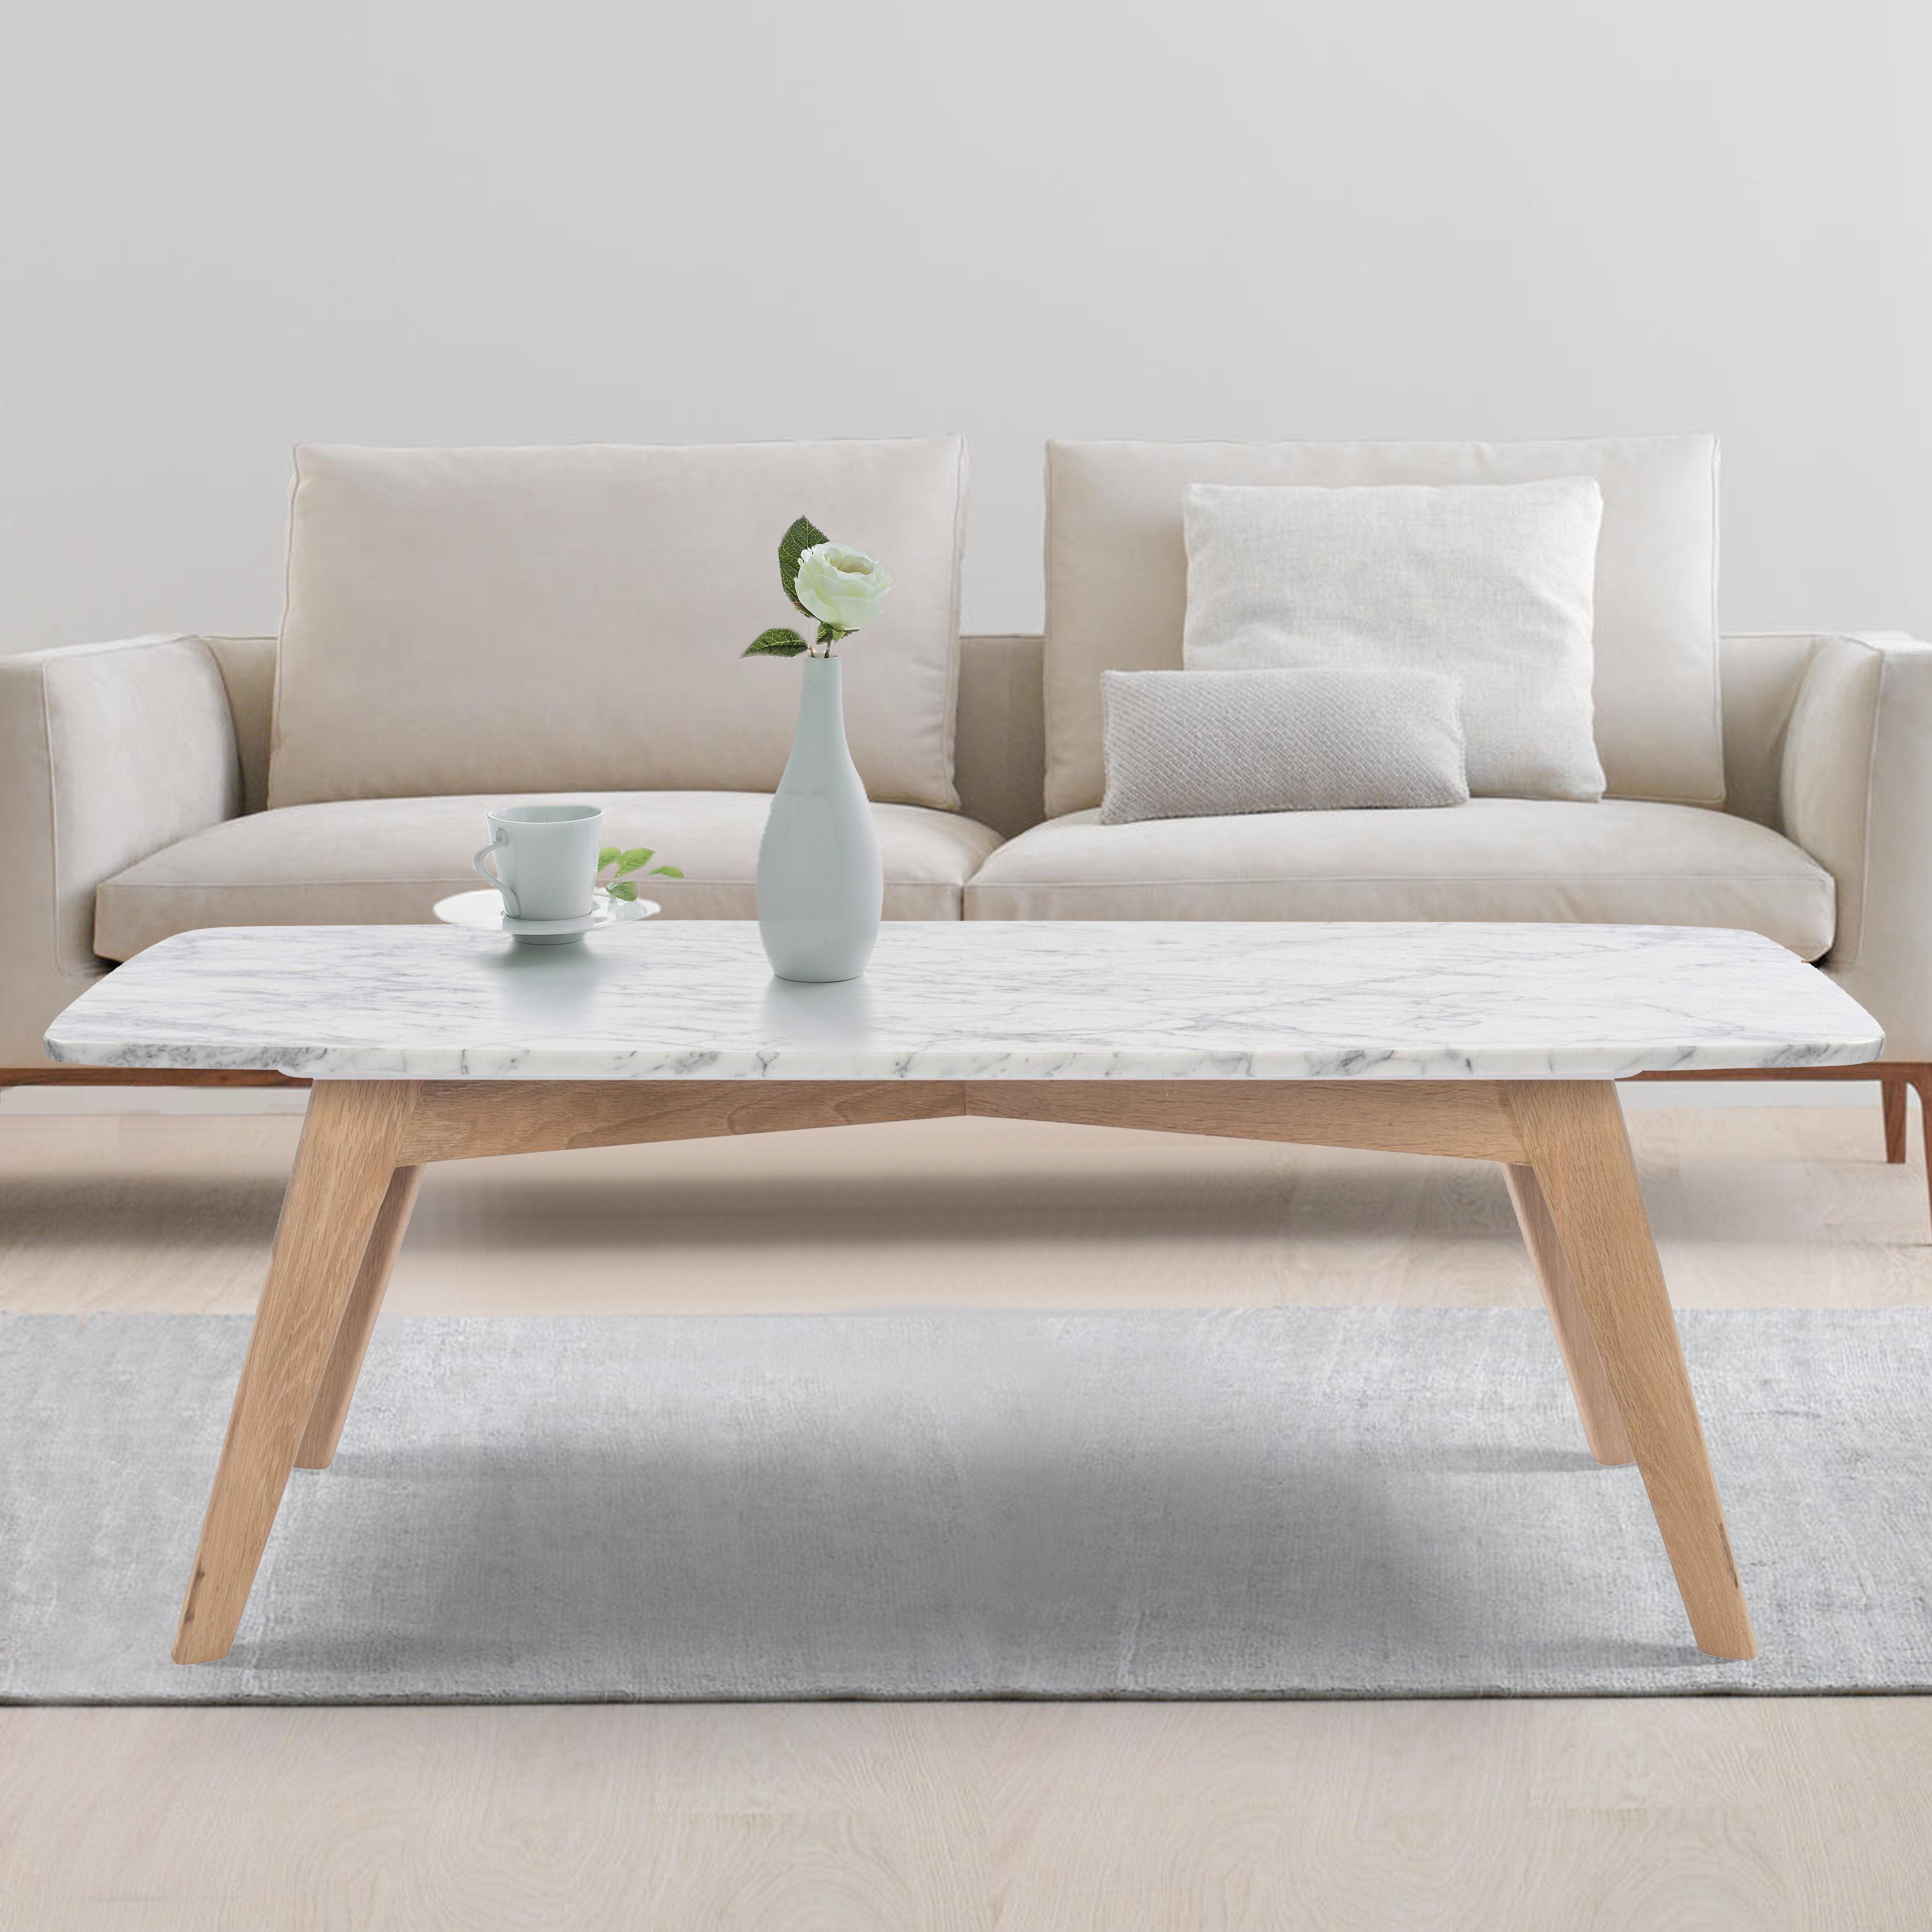 Ivy Bronx Hilma Rectangular Italian Carrara White Marble Table Coffee Table Reviews Wayfair